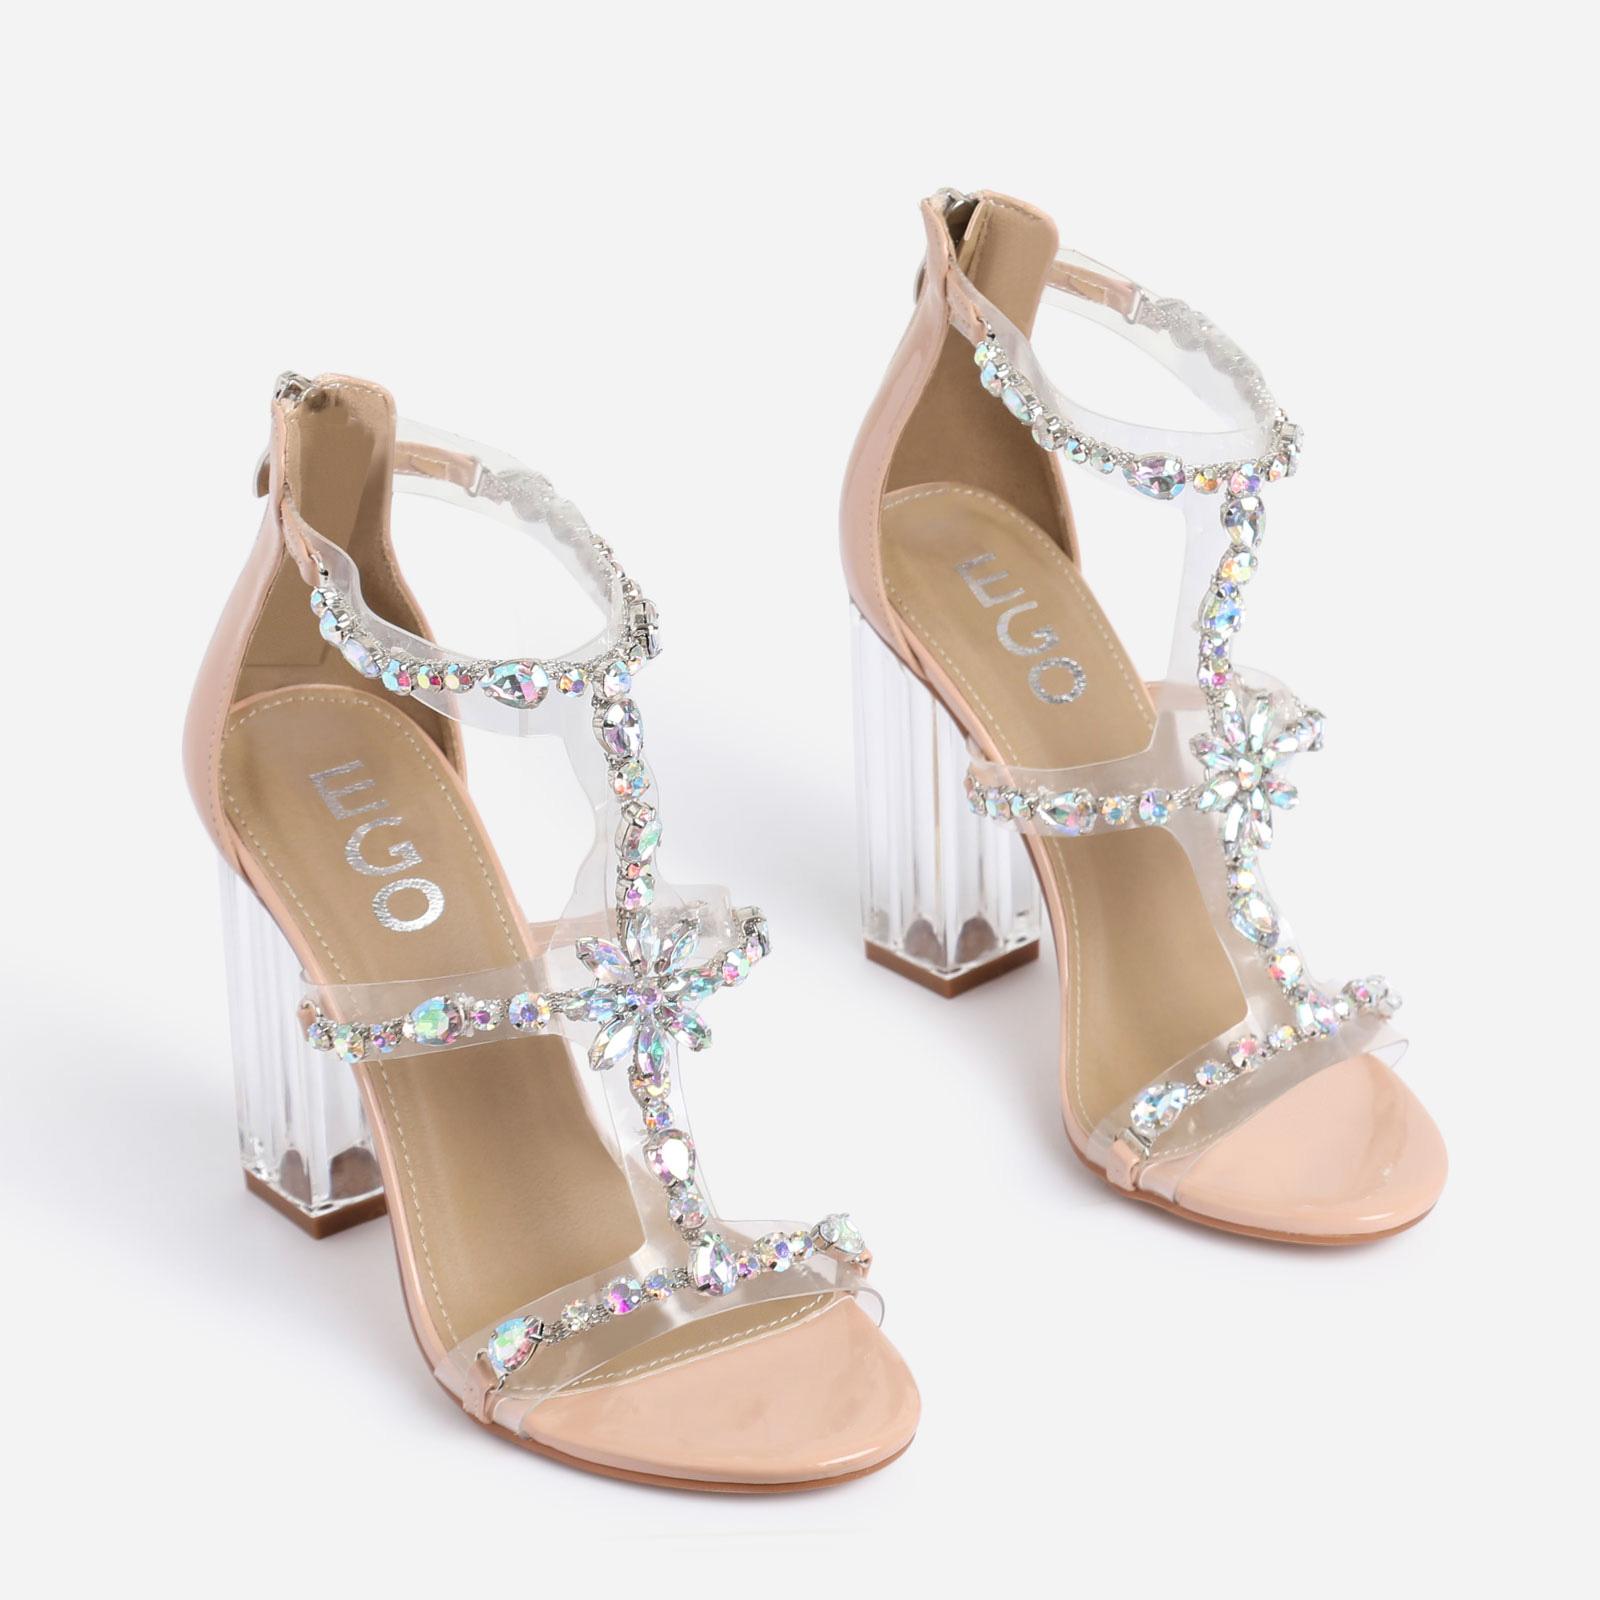 Merryme Jewel Embellished Perspex Block Heel In Nude Patent